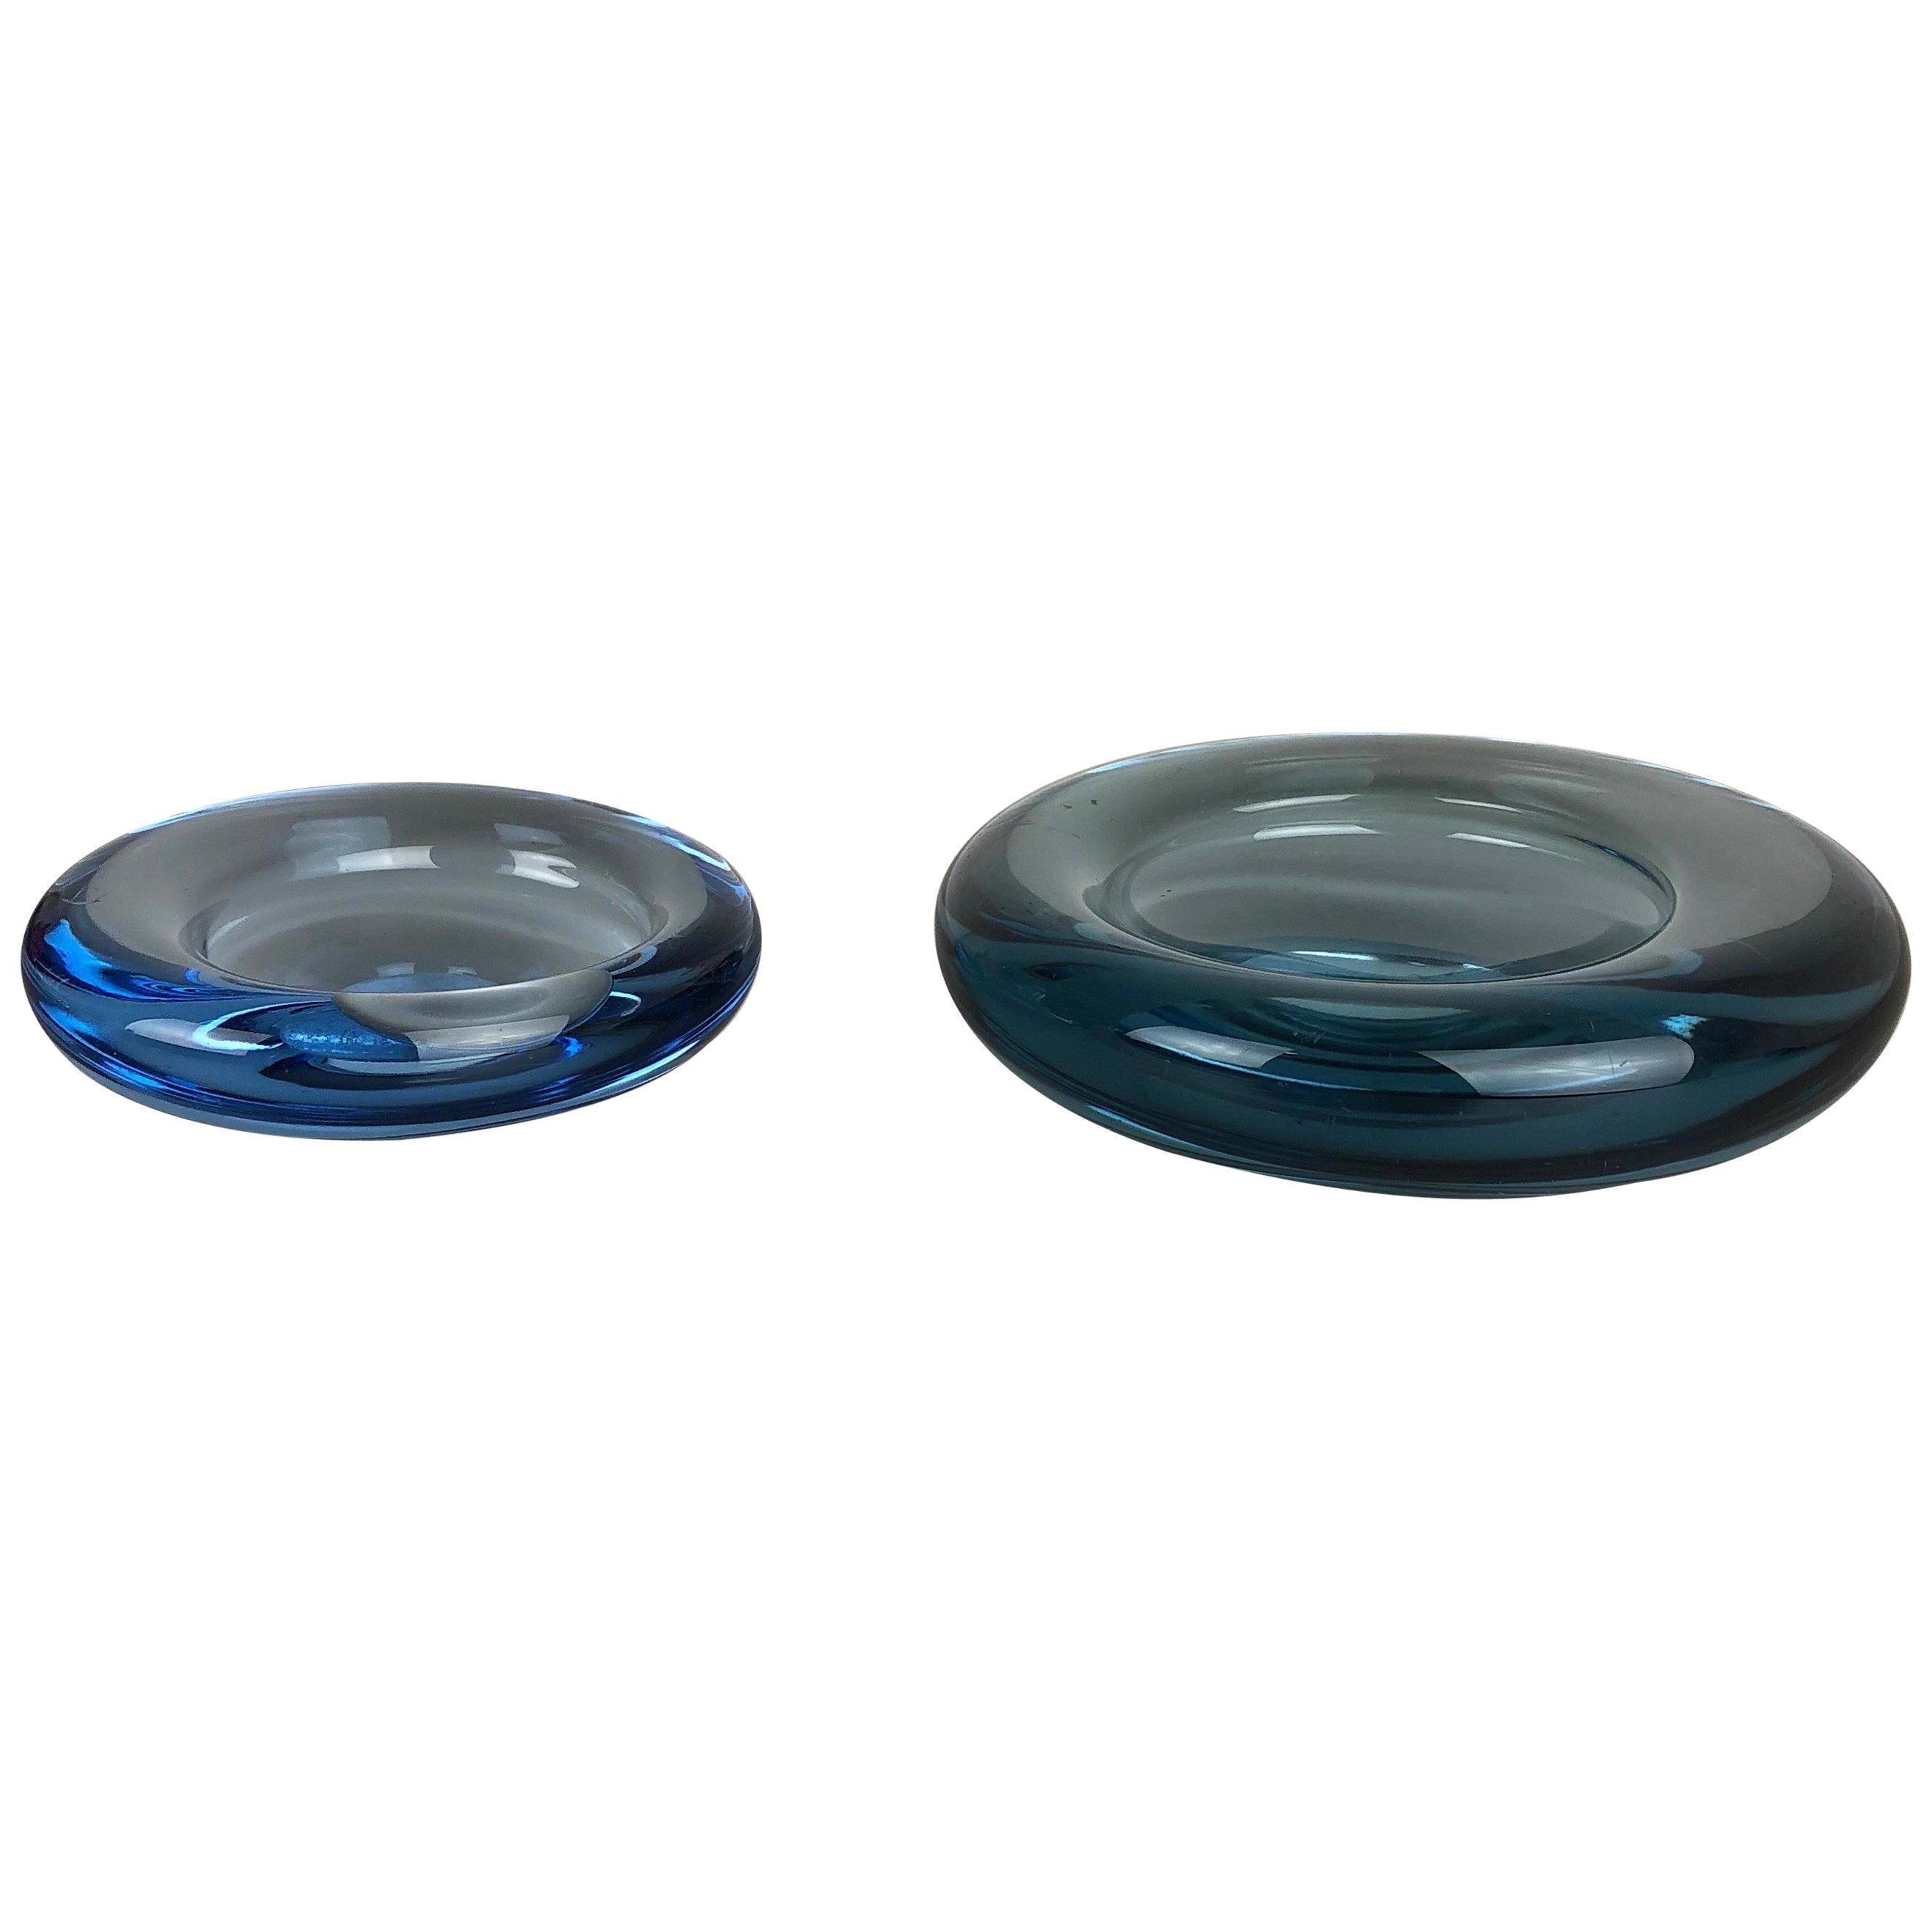 Set of 2 Glass Shell Bowl Elements by Per Lutken for Holmegaard, Denmark, 1960s